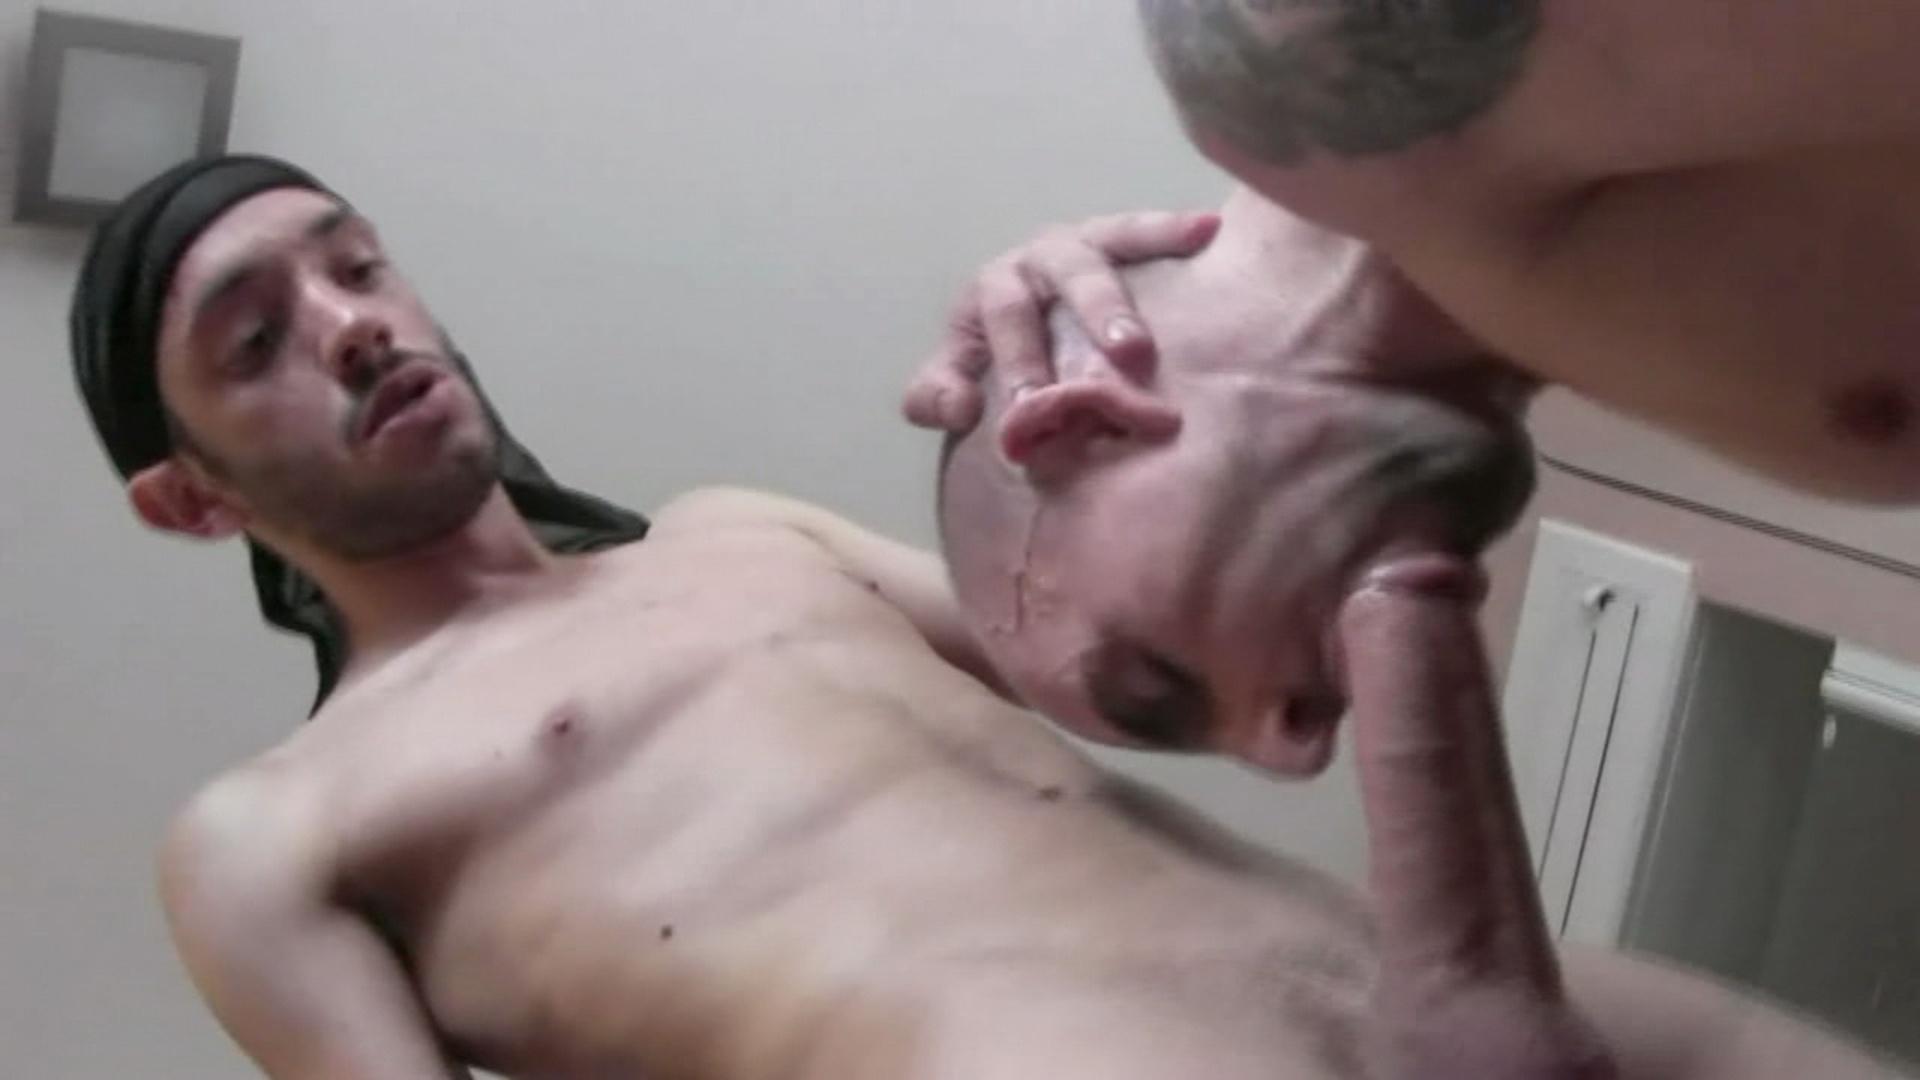 Hole Wrecker 5 Xvideo gay